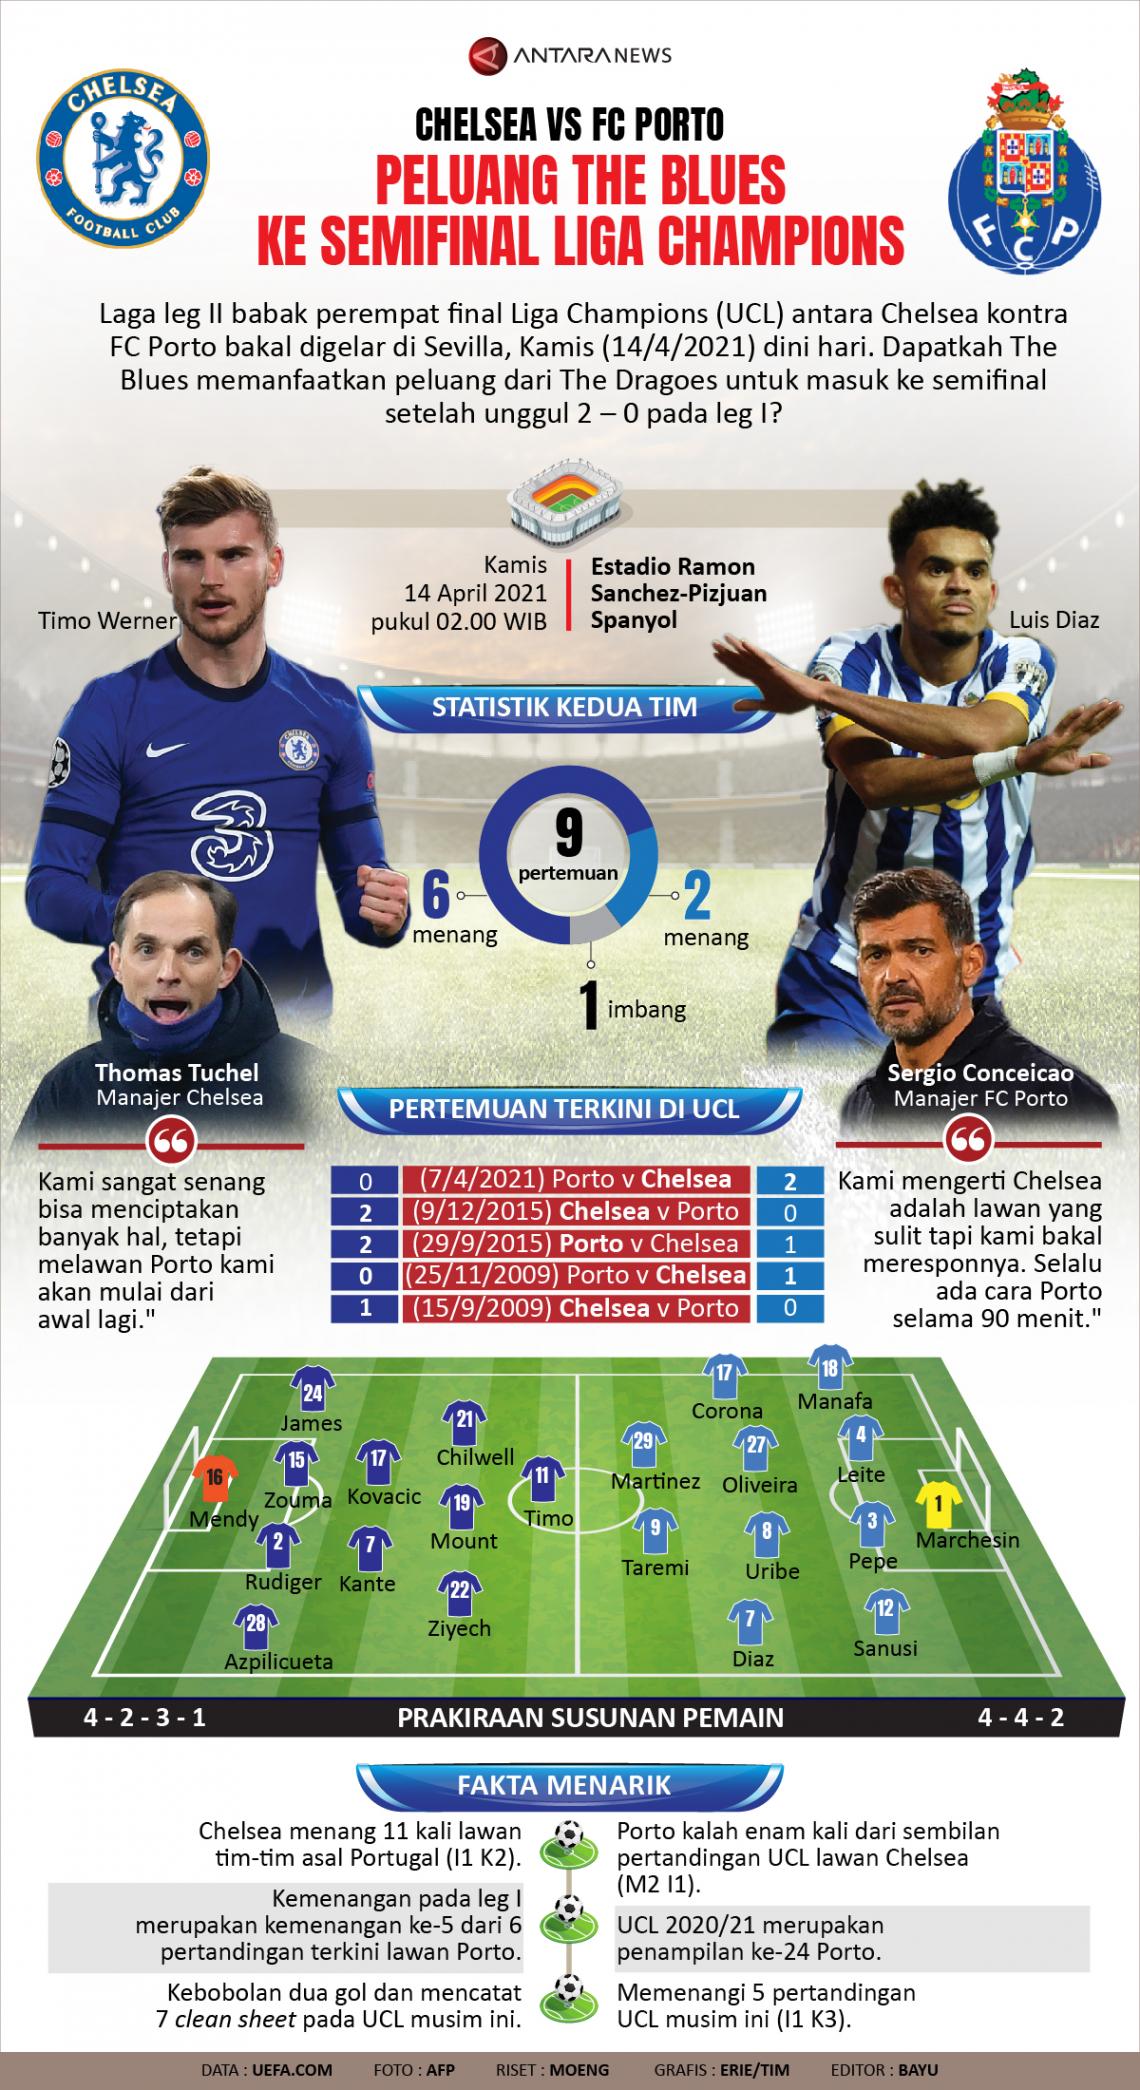 Chelsea vs FC Porto: Peluang The Blues ke Semifinal Liga Champions